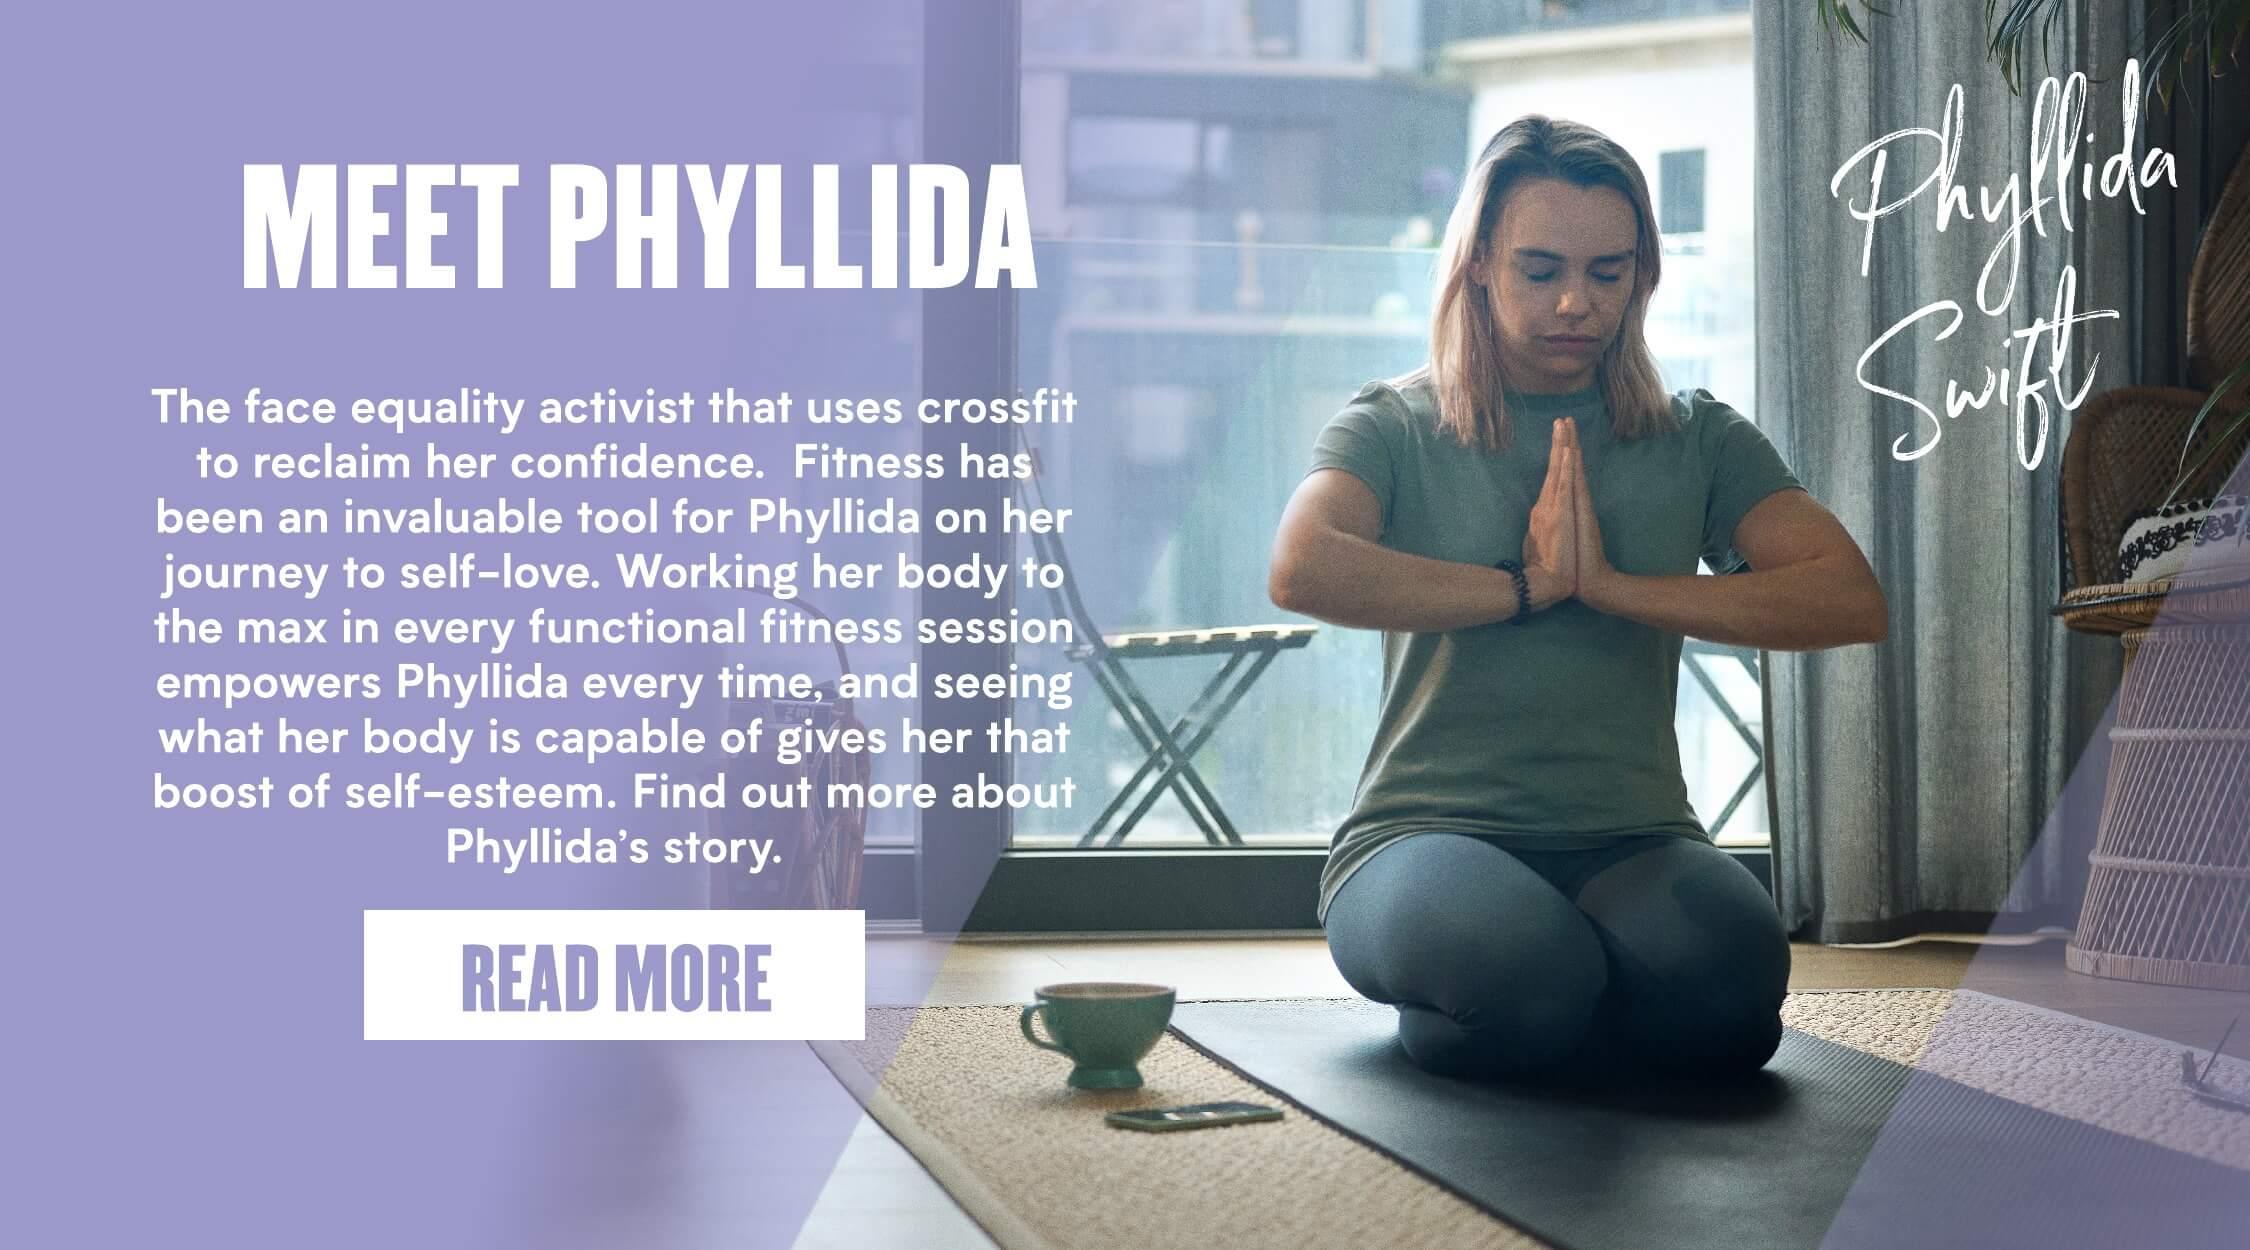 https://www.myprotein.com.my/blog/our-ambassadors/meet-phyllida-activist-by-night-050721/